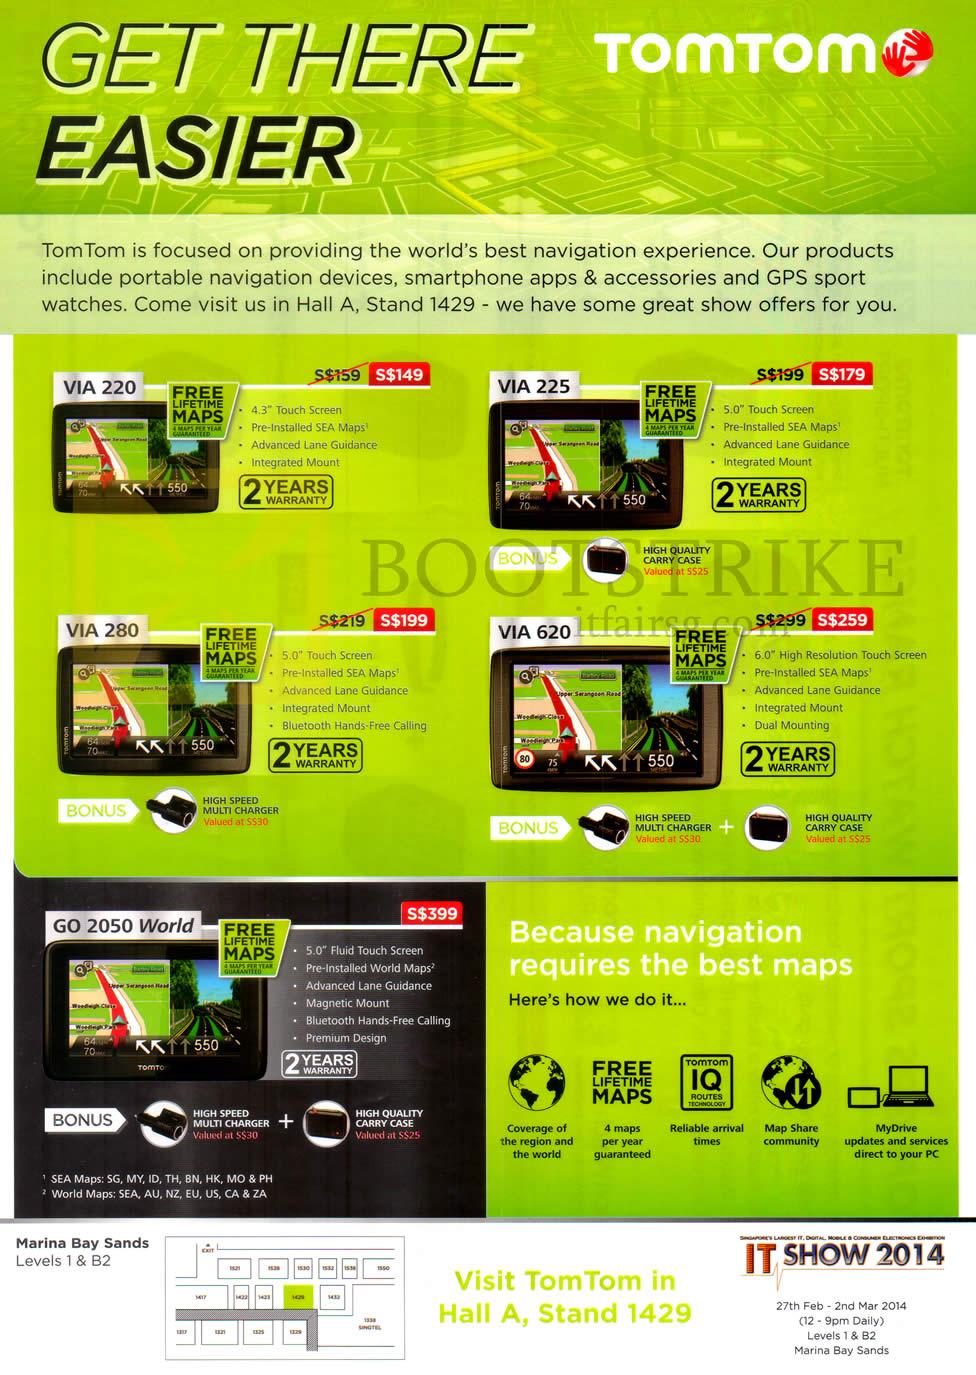 IT SHOW 2014 price list image brochure of Tomtom GPS Navigators VIA 220, 225, 280, 620, GO 2050 World